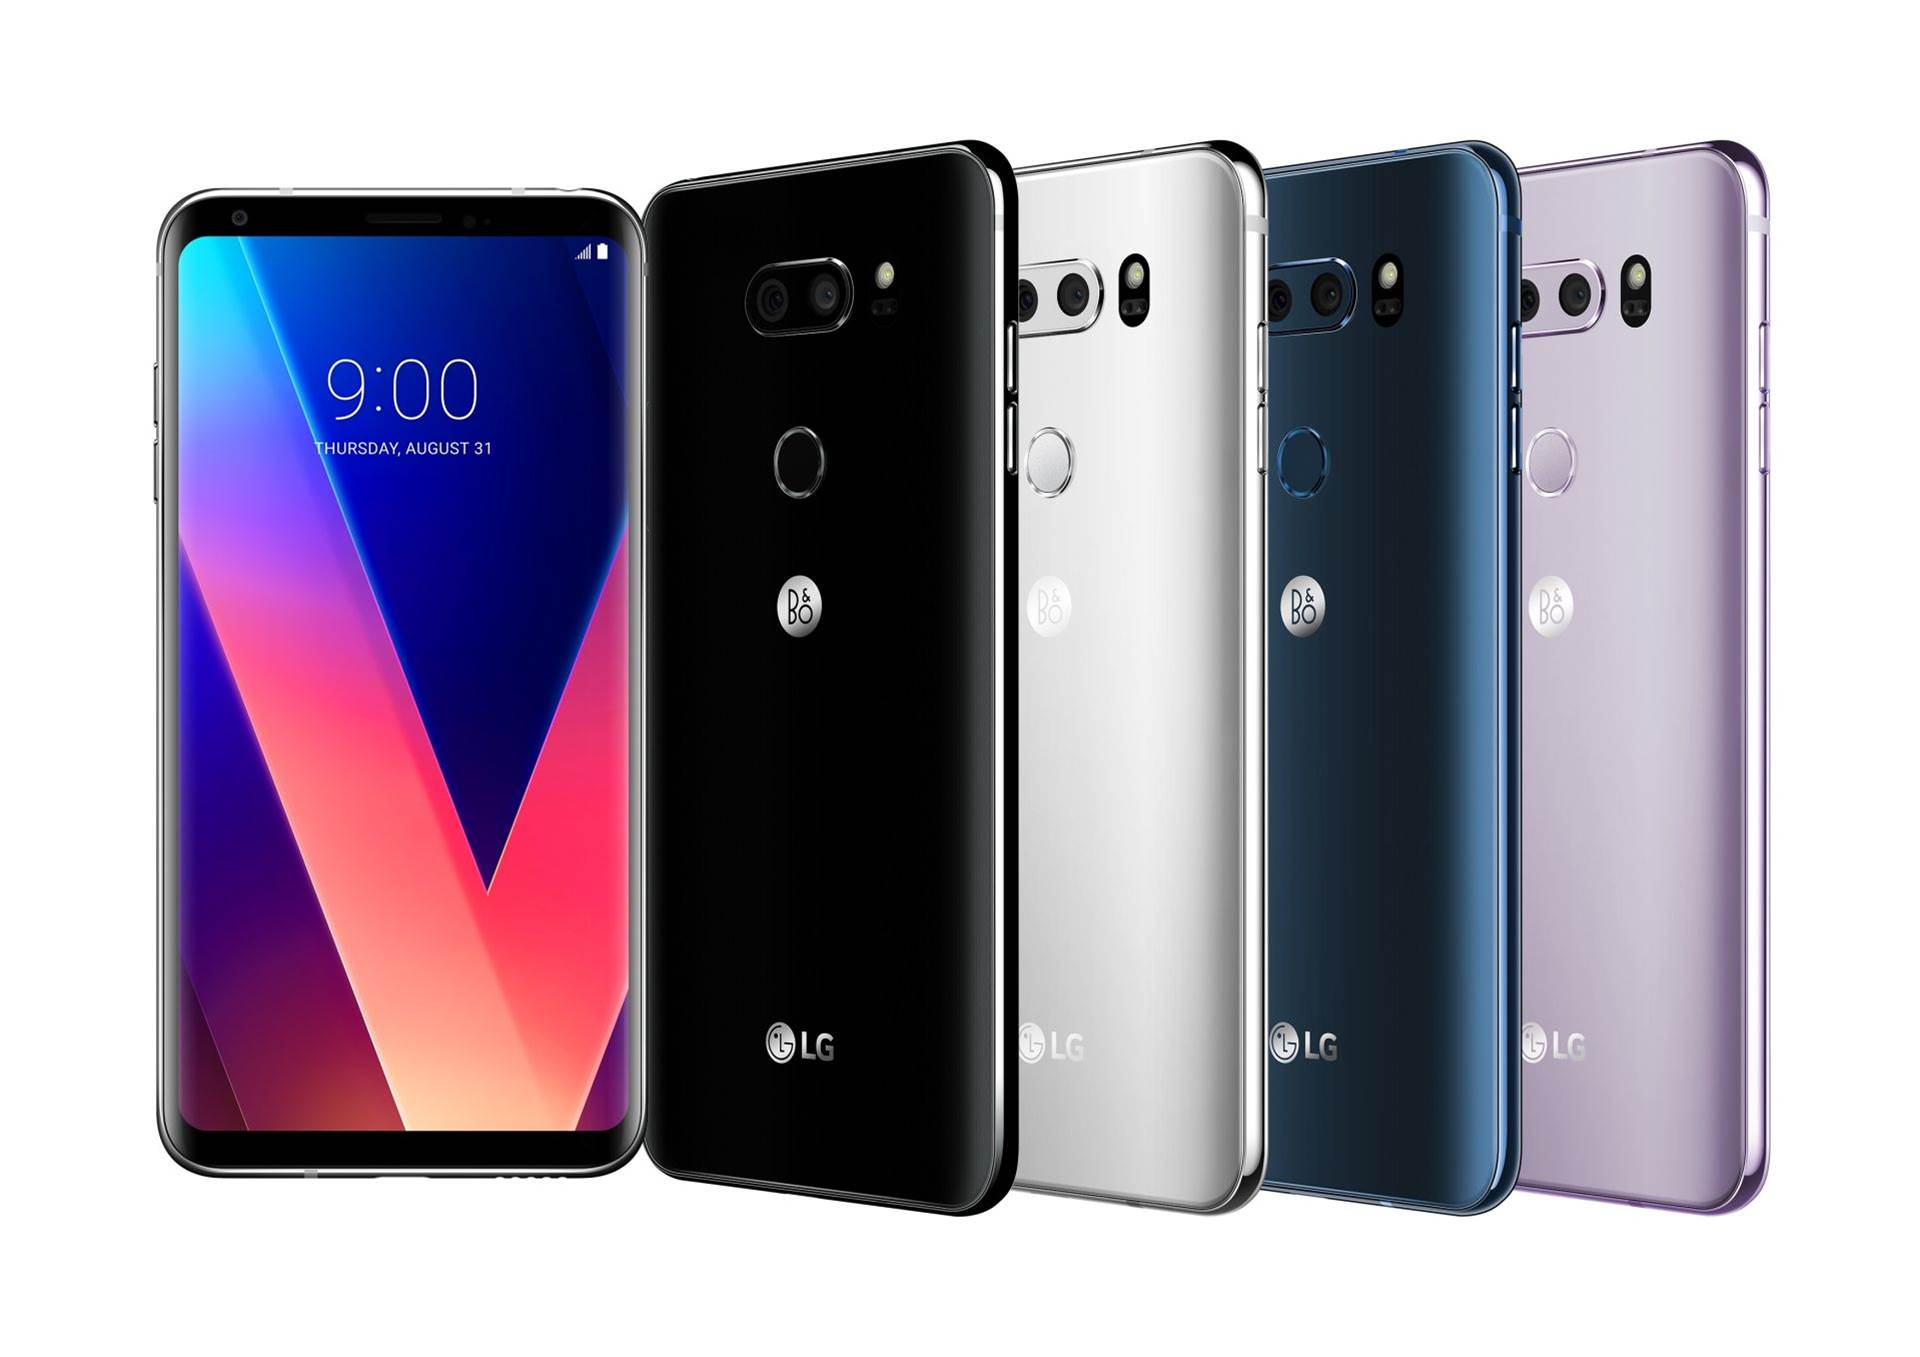 Review: LG V30+ smartphone